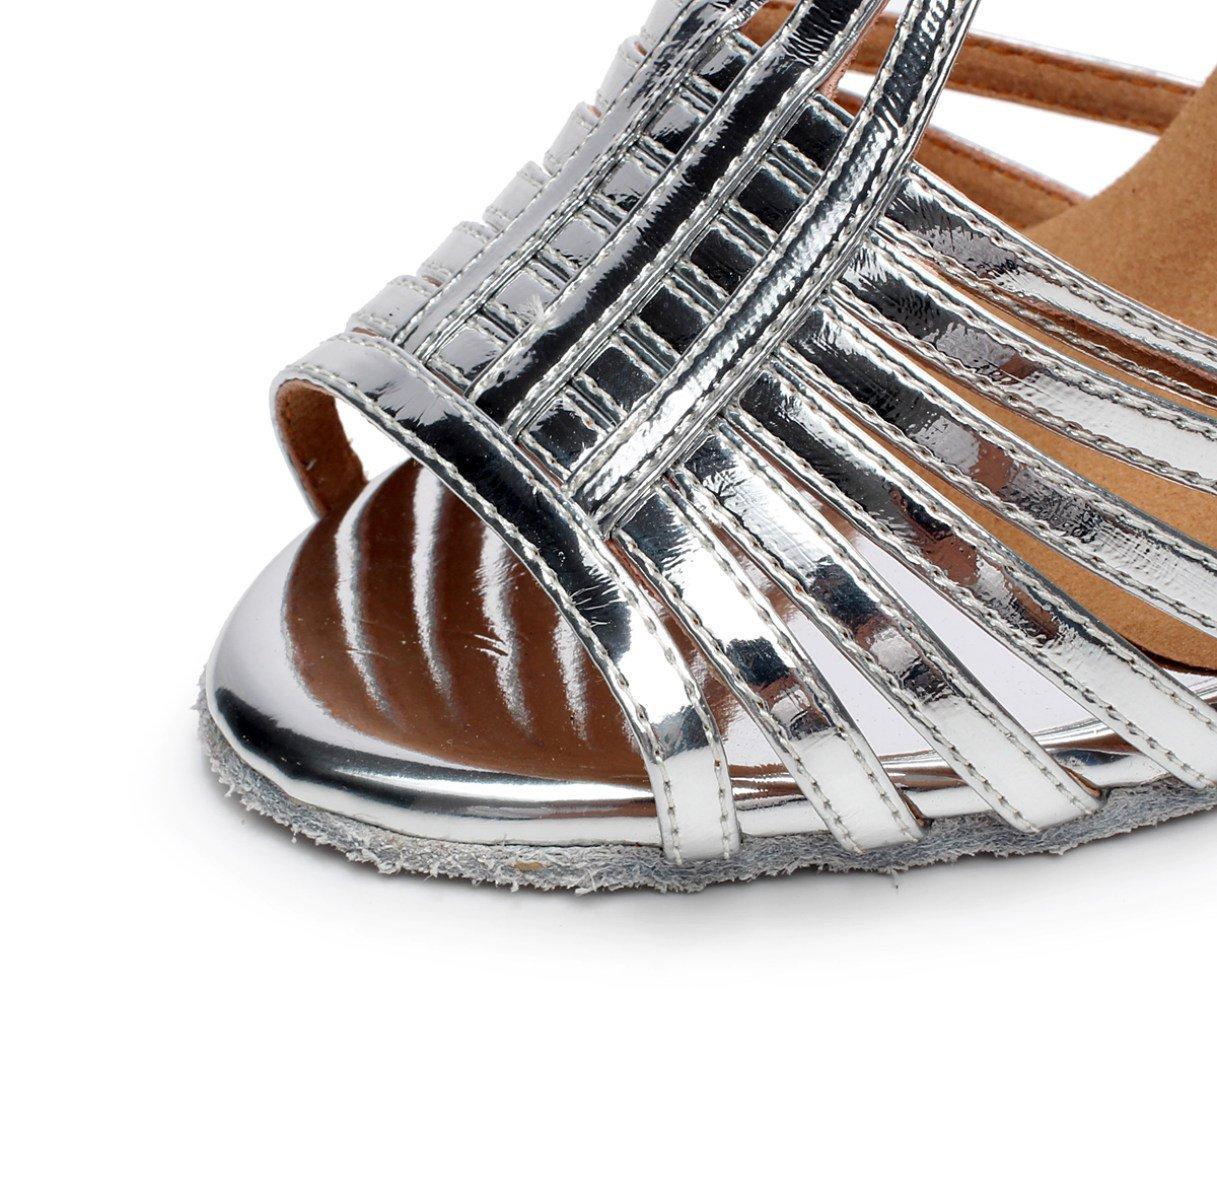 JSHOE Lateinamerikanische Damenschuhe Salsa / Samba Tango / Chacha / Samba / / Modern / Jazz Schuhe Sandalen High Heels,Silver-heeled8.5cm-UK4/EU35/Our36 - 0f5c92